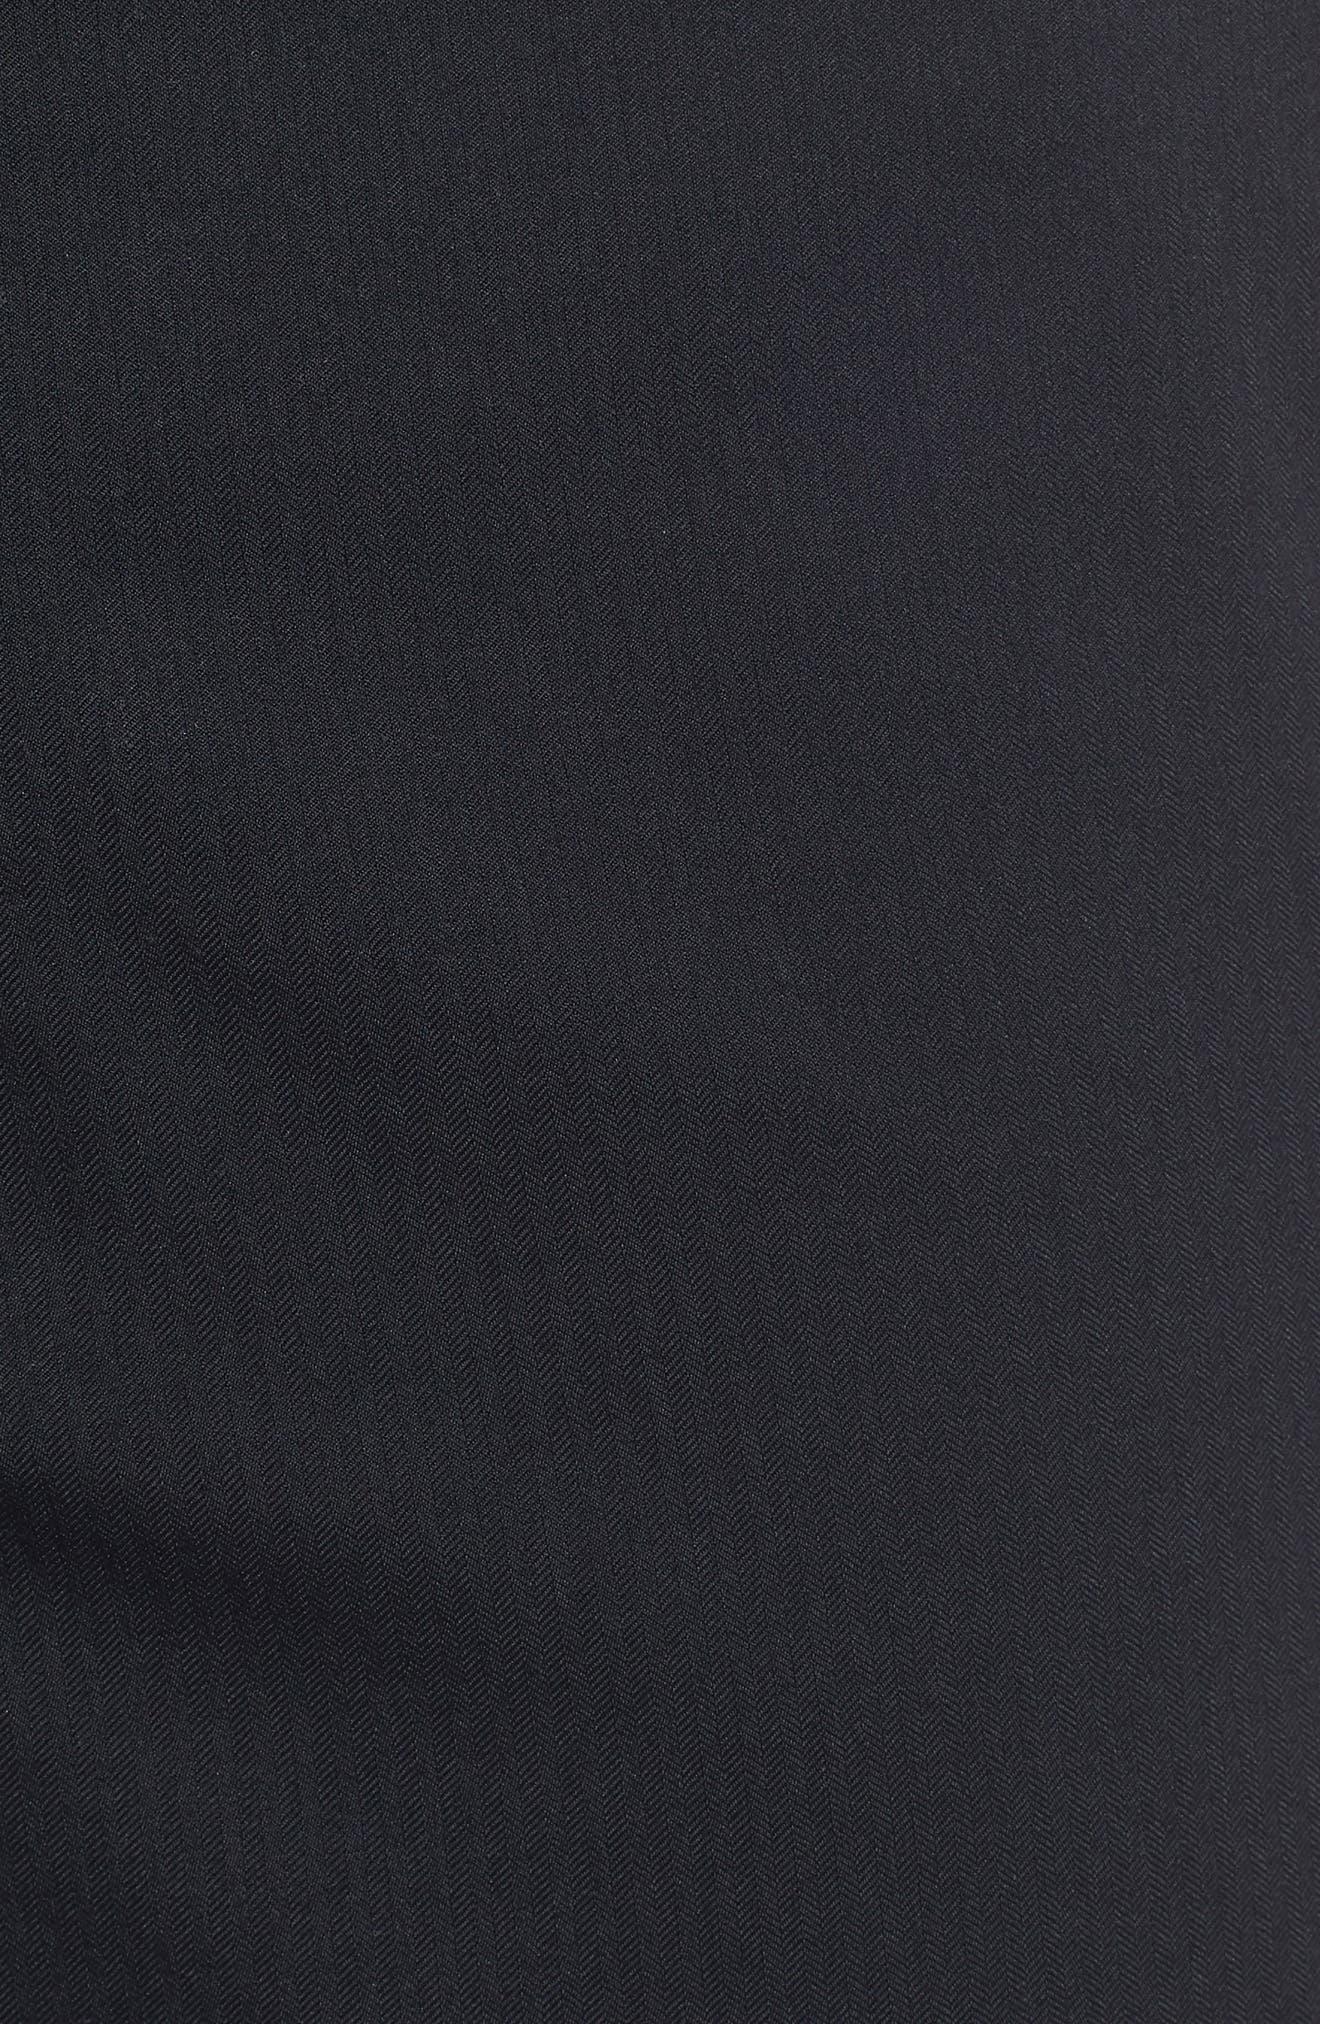 Takeover Regular Fit Golf Shorts,                             Alternate thumbnail 5, color,                             BLACK